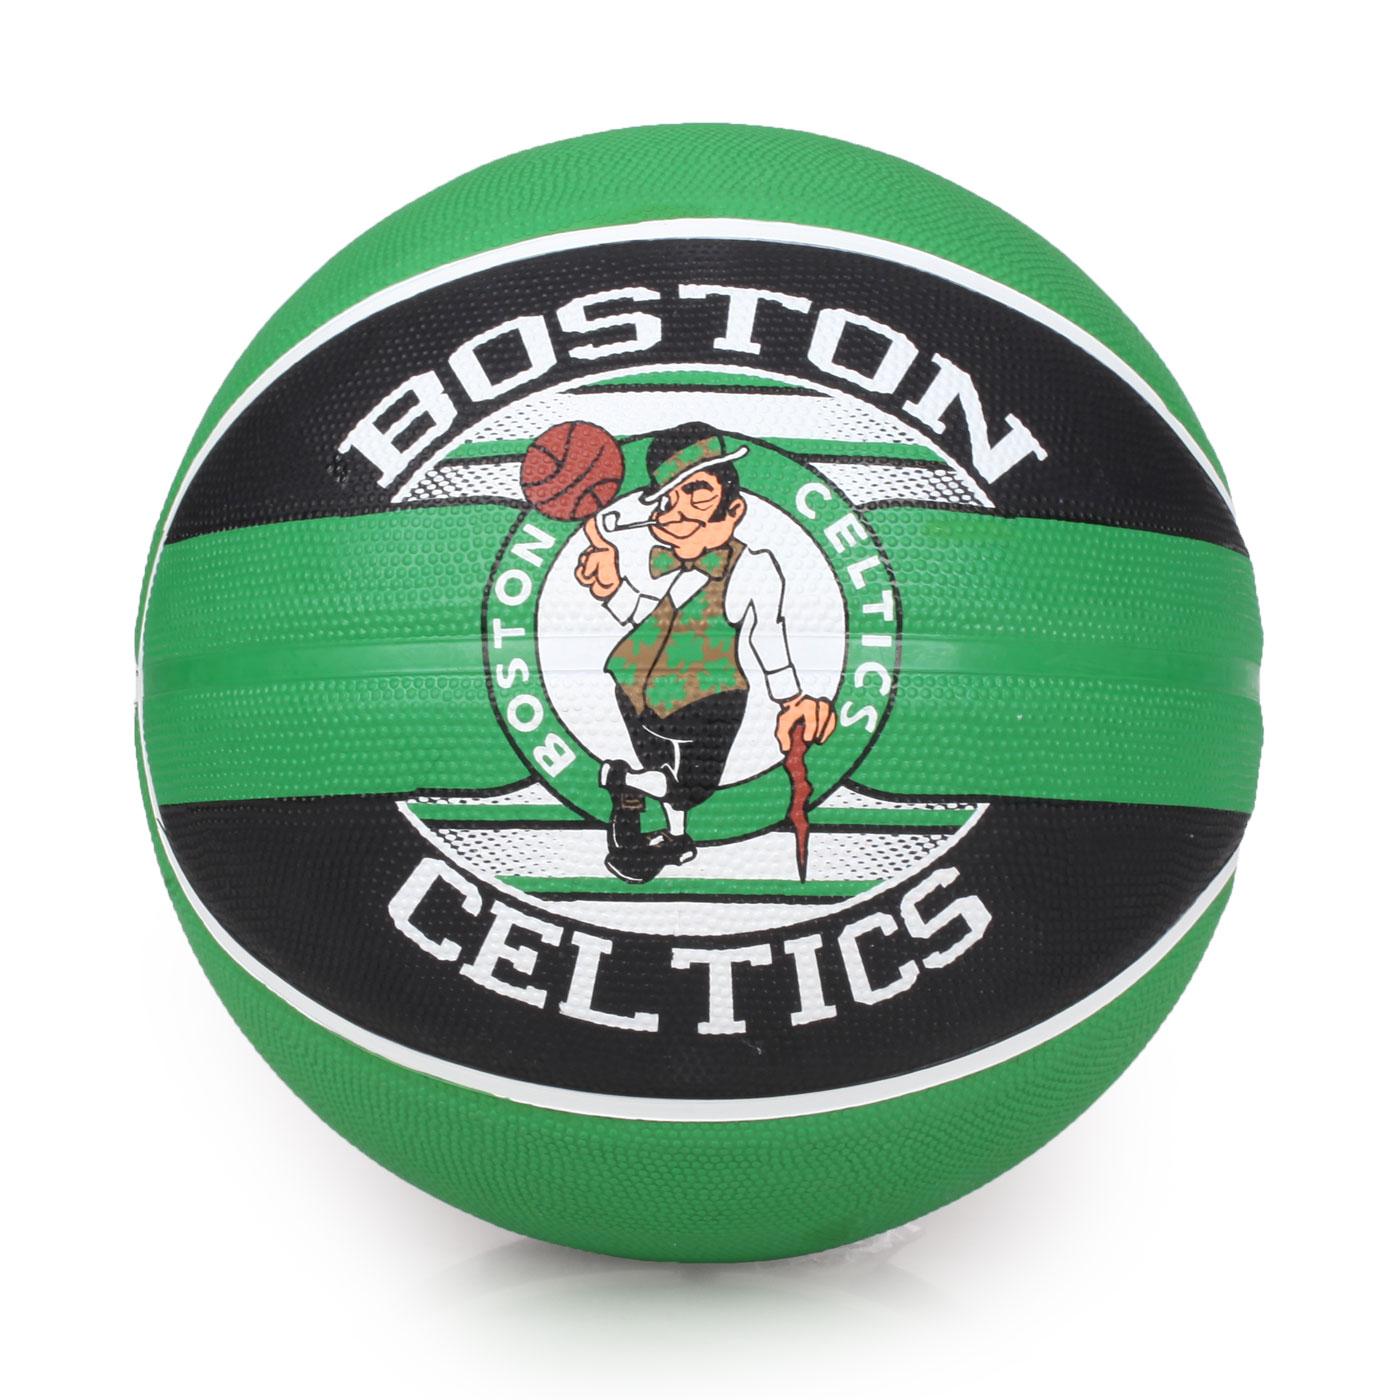 SPALDING 賽爾提克 Celtics 籃球 SPA83505